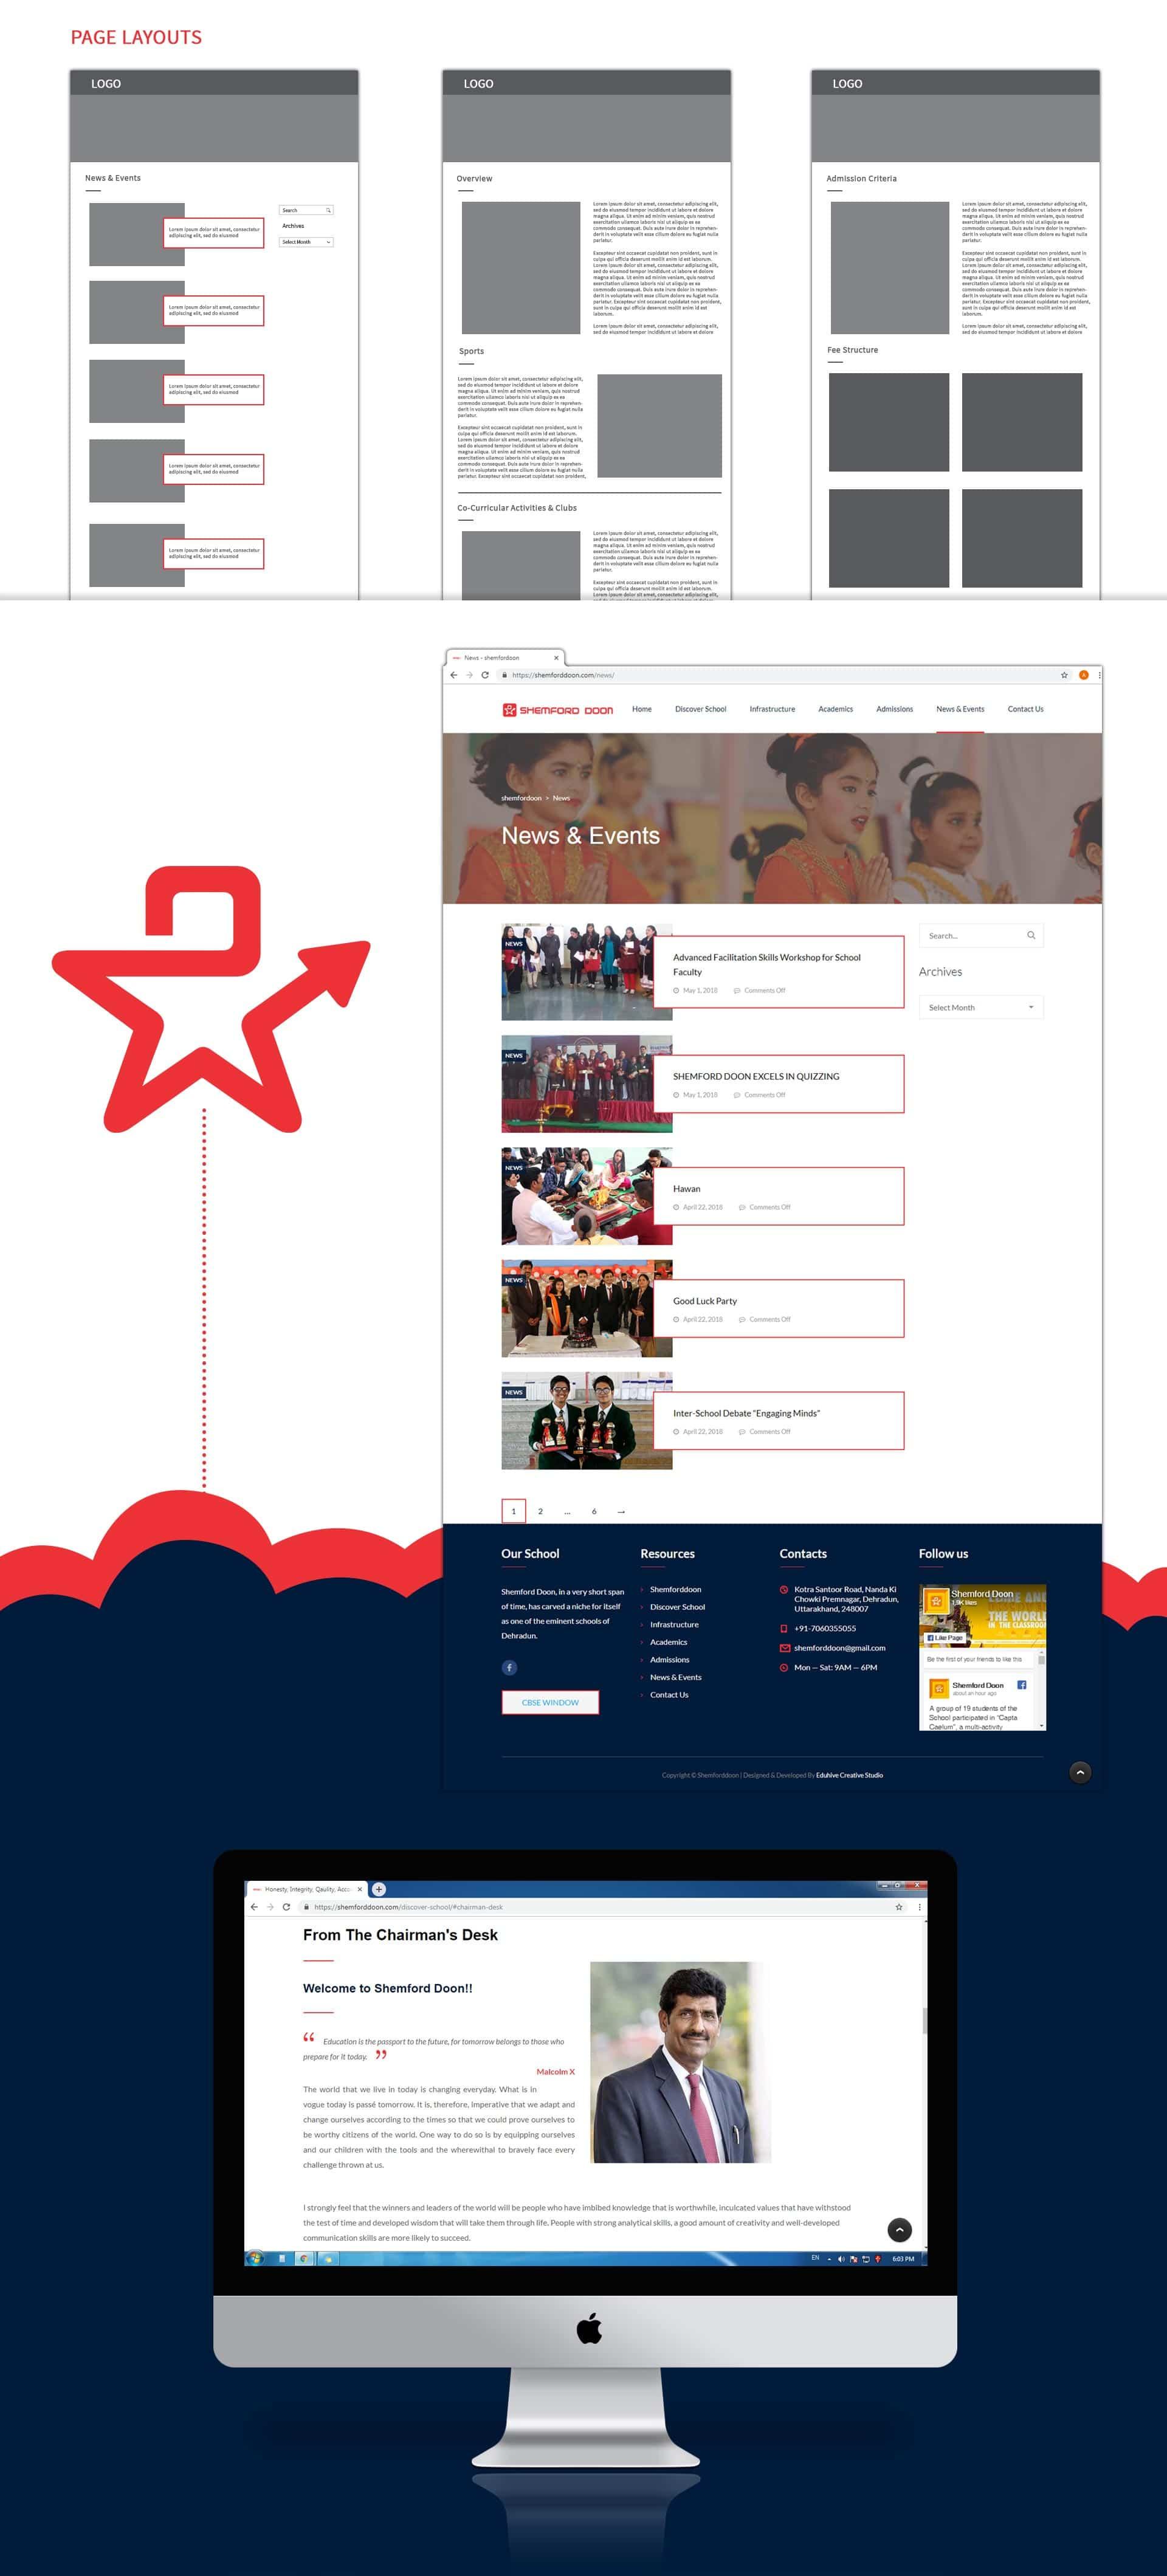 Website-Interface-Design-Services-in-Delhi-NCR